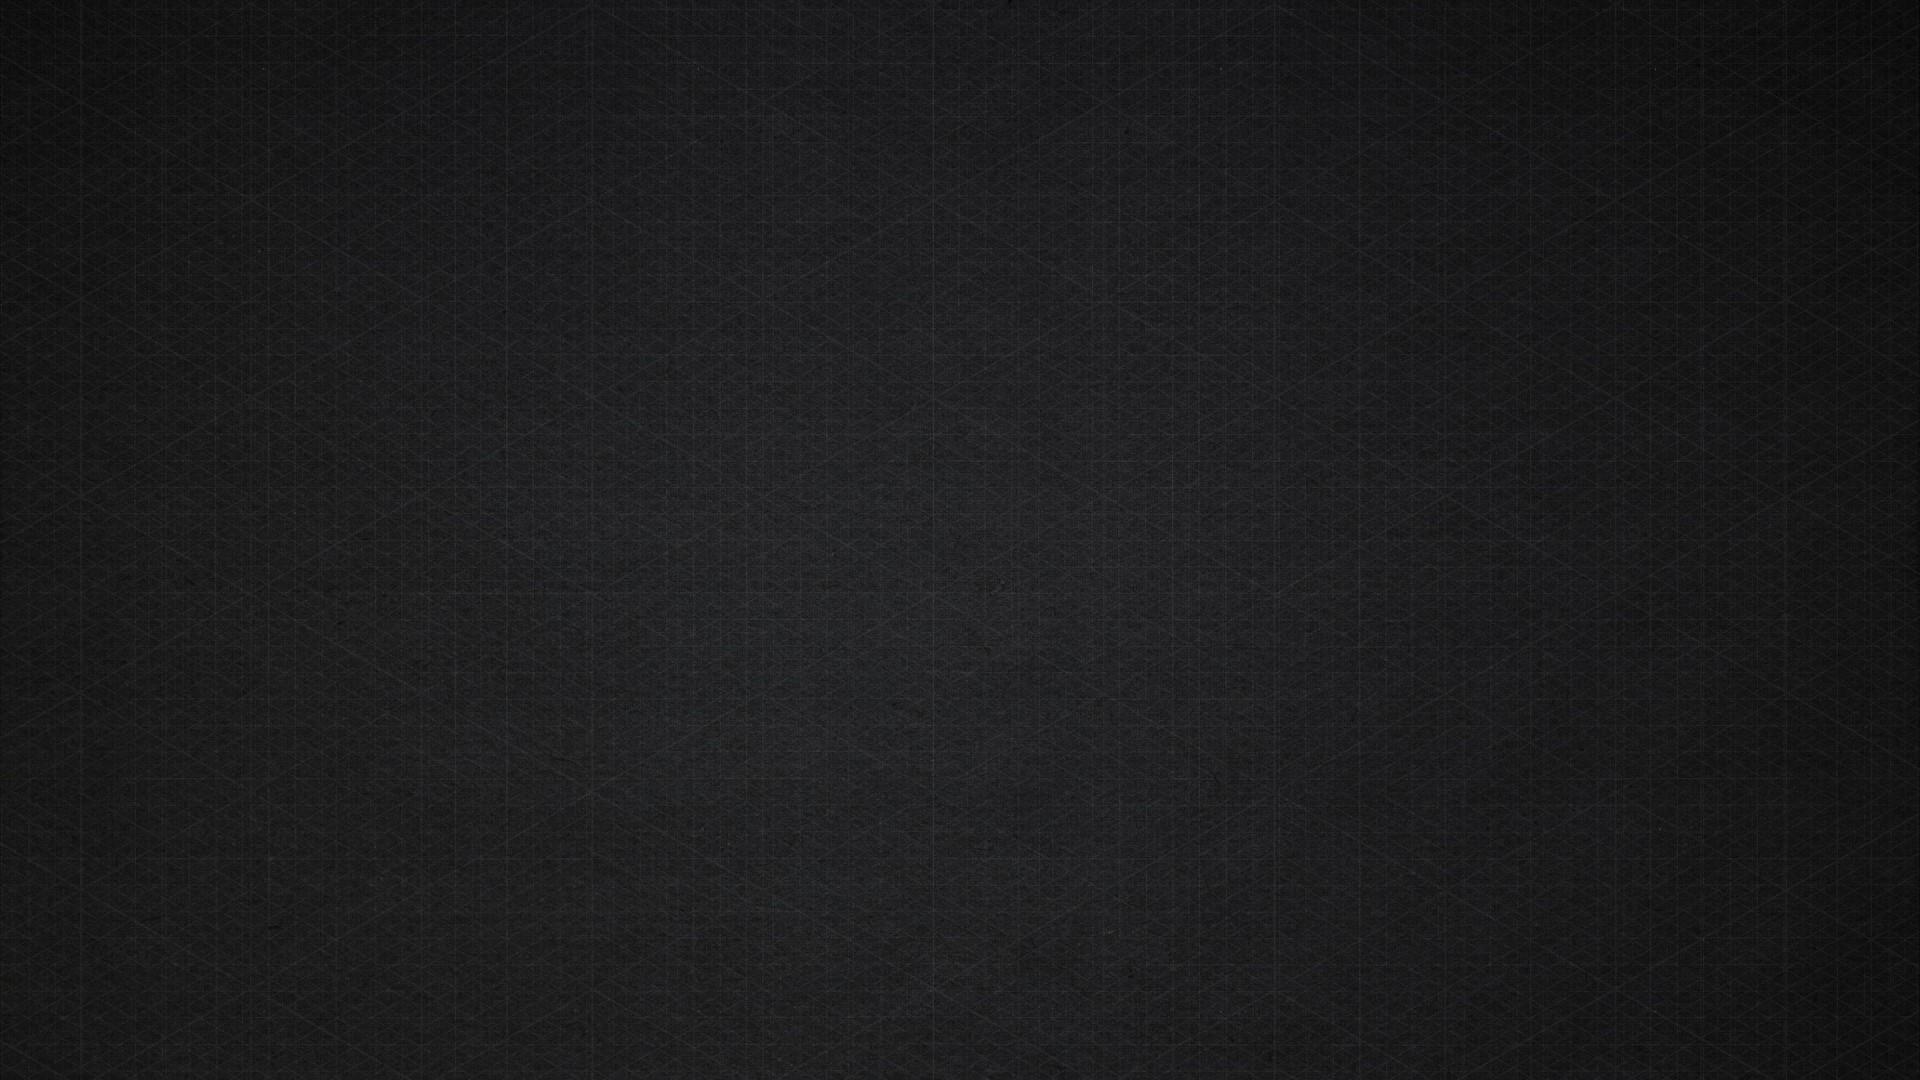 Aesthetic Black Wallpaper Desktop